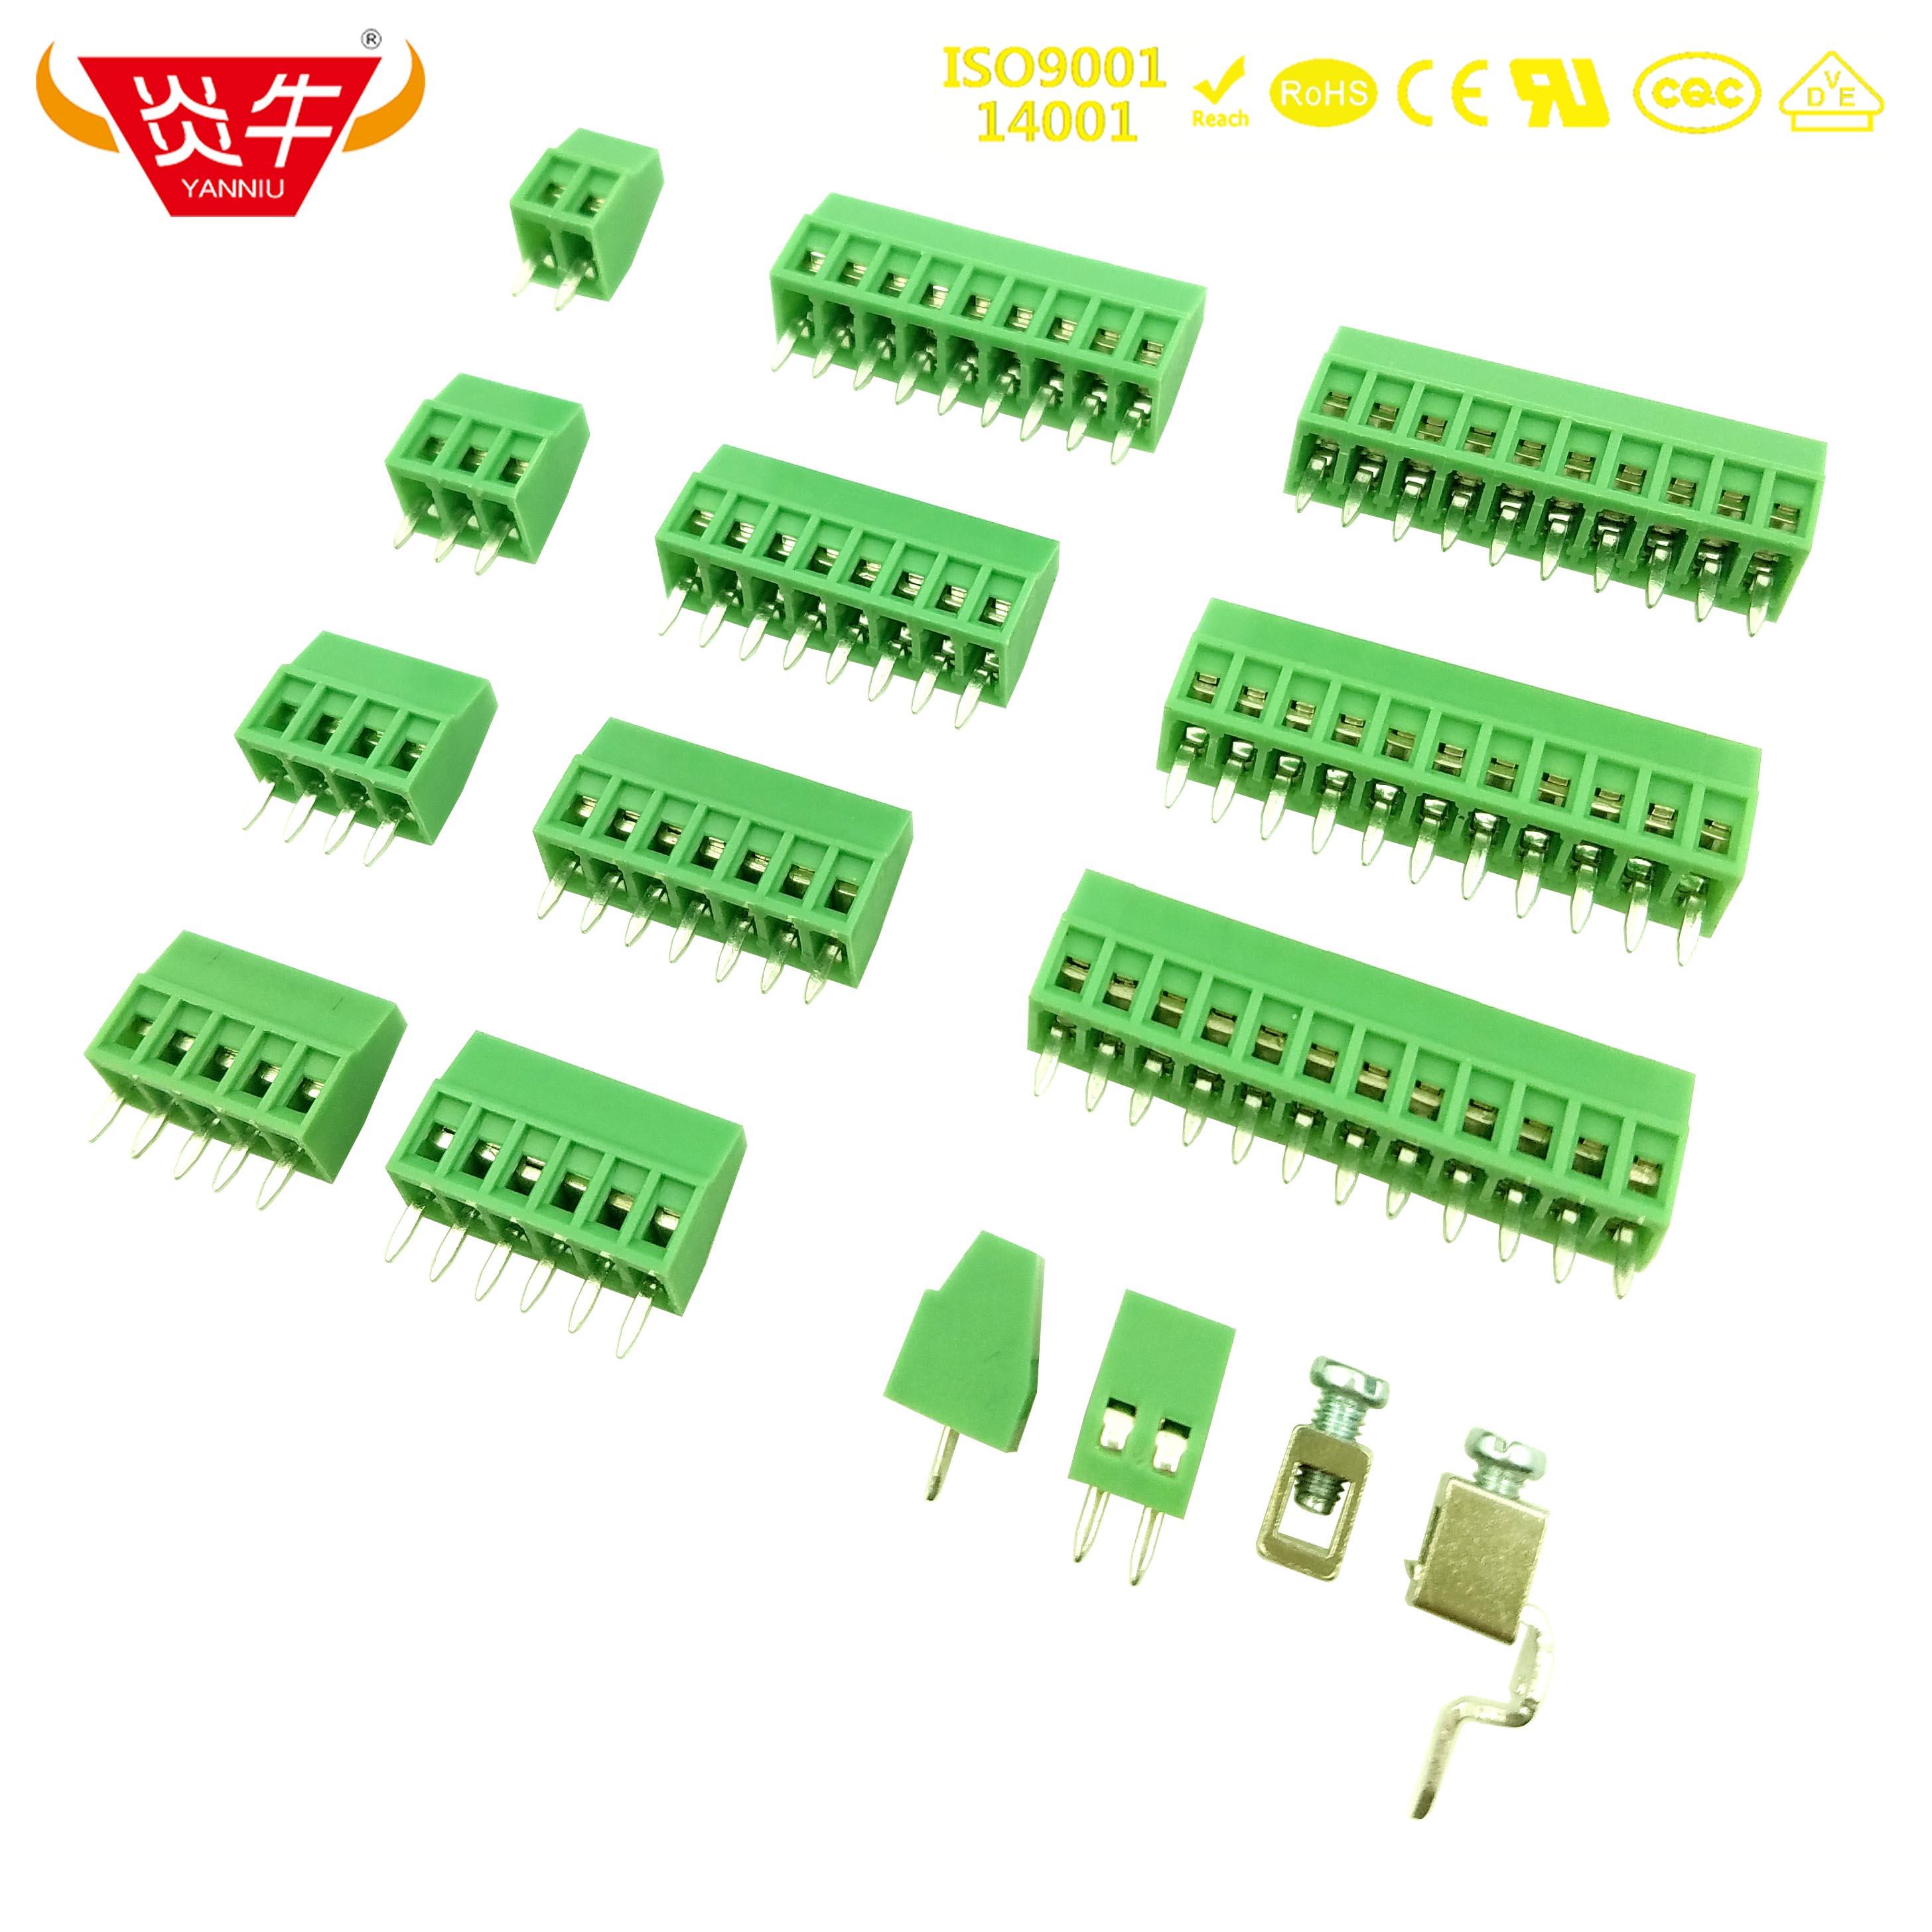 KF128 2.54 2P ~ 12P MINI PCB CONNECTOR SCREW TERMINAL BLOCKS DG308 KF308 2.54mm MPT 0,5/2-2,54 - 1725656 PHOENIX CONTACT DEGSON